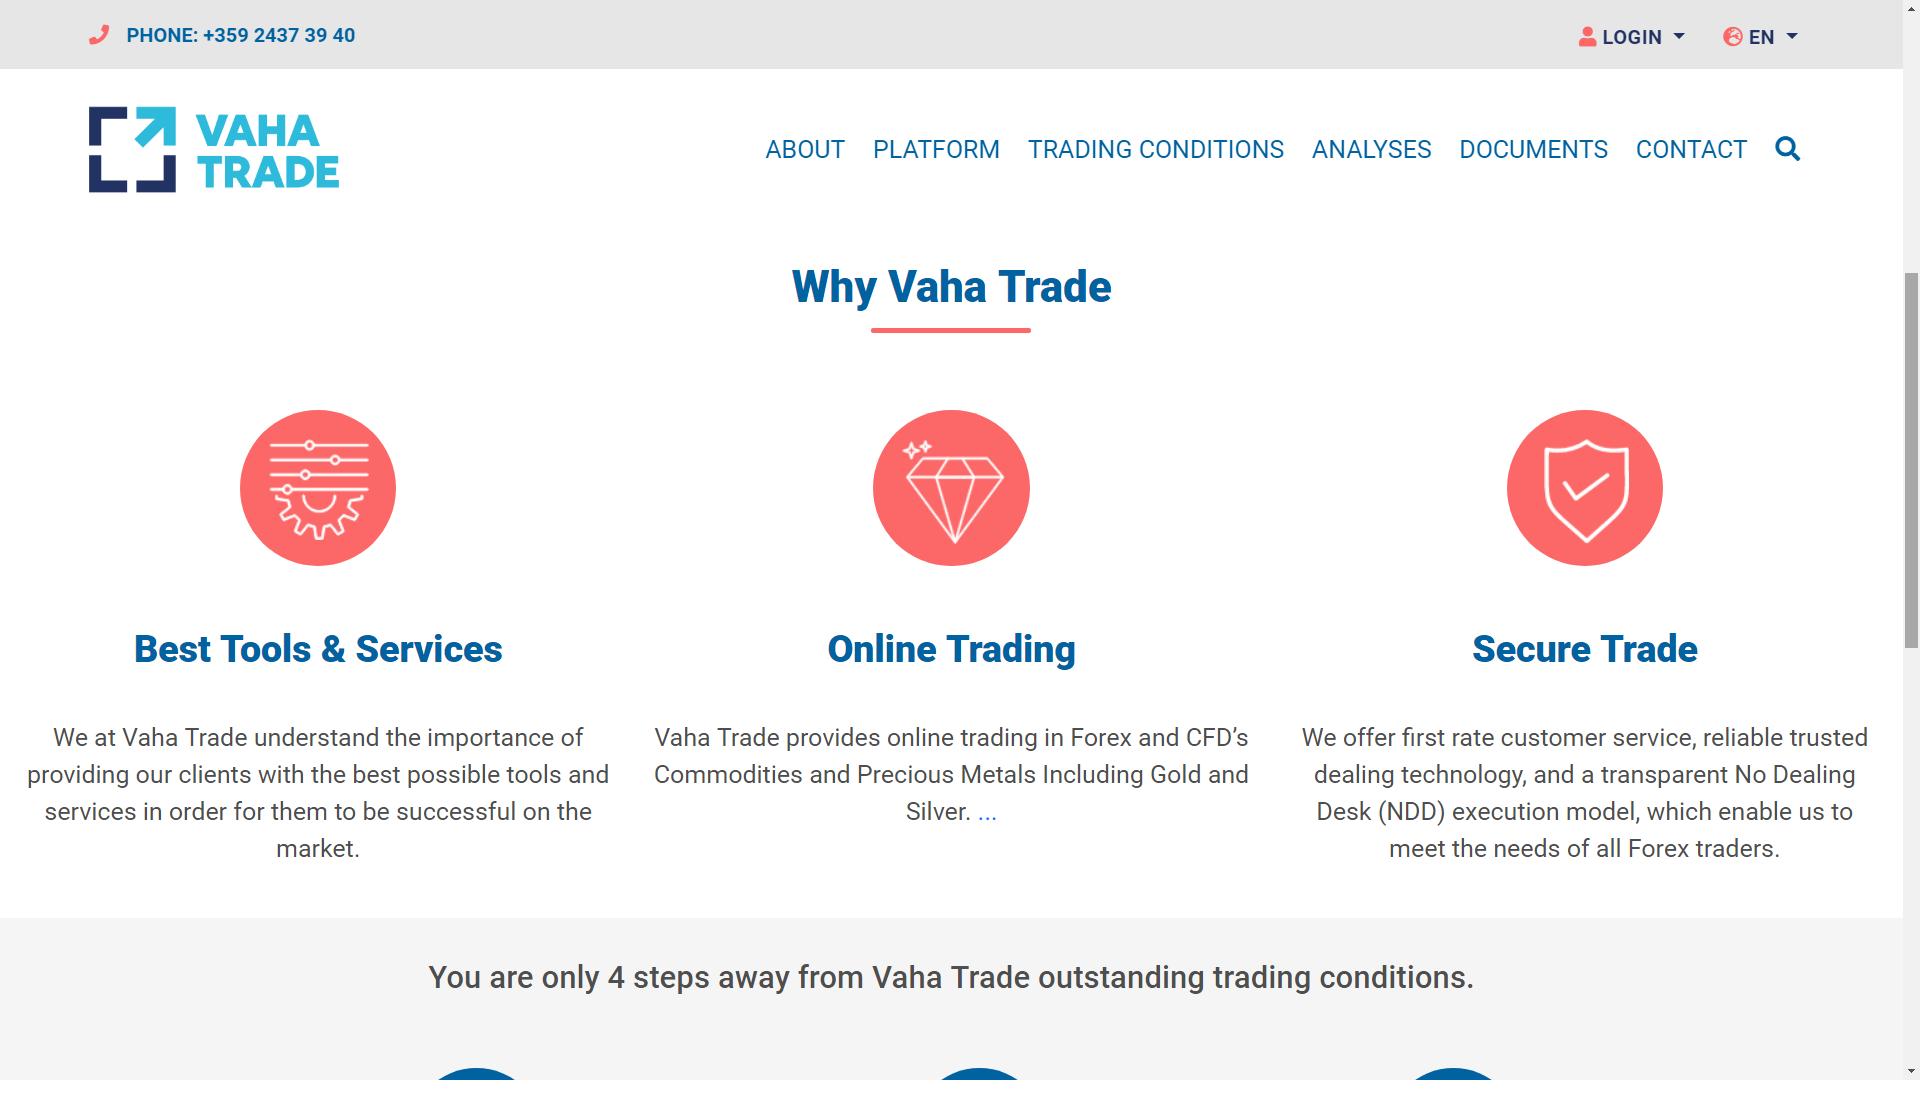 vaha trade logo